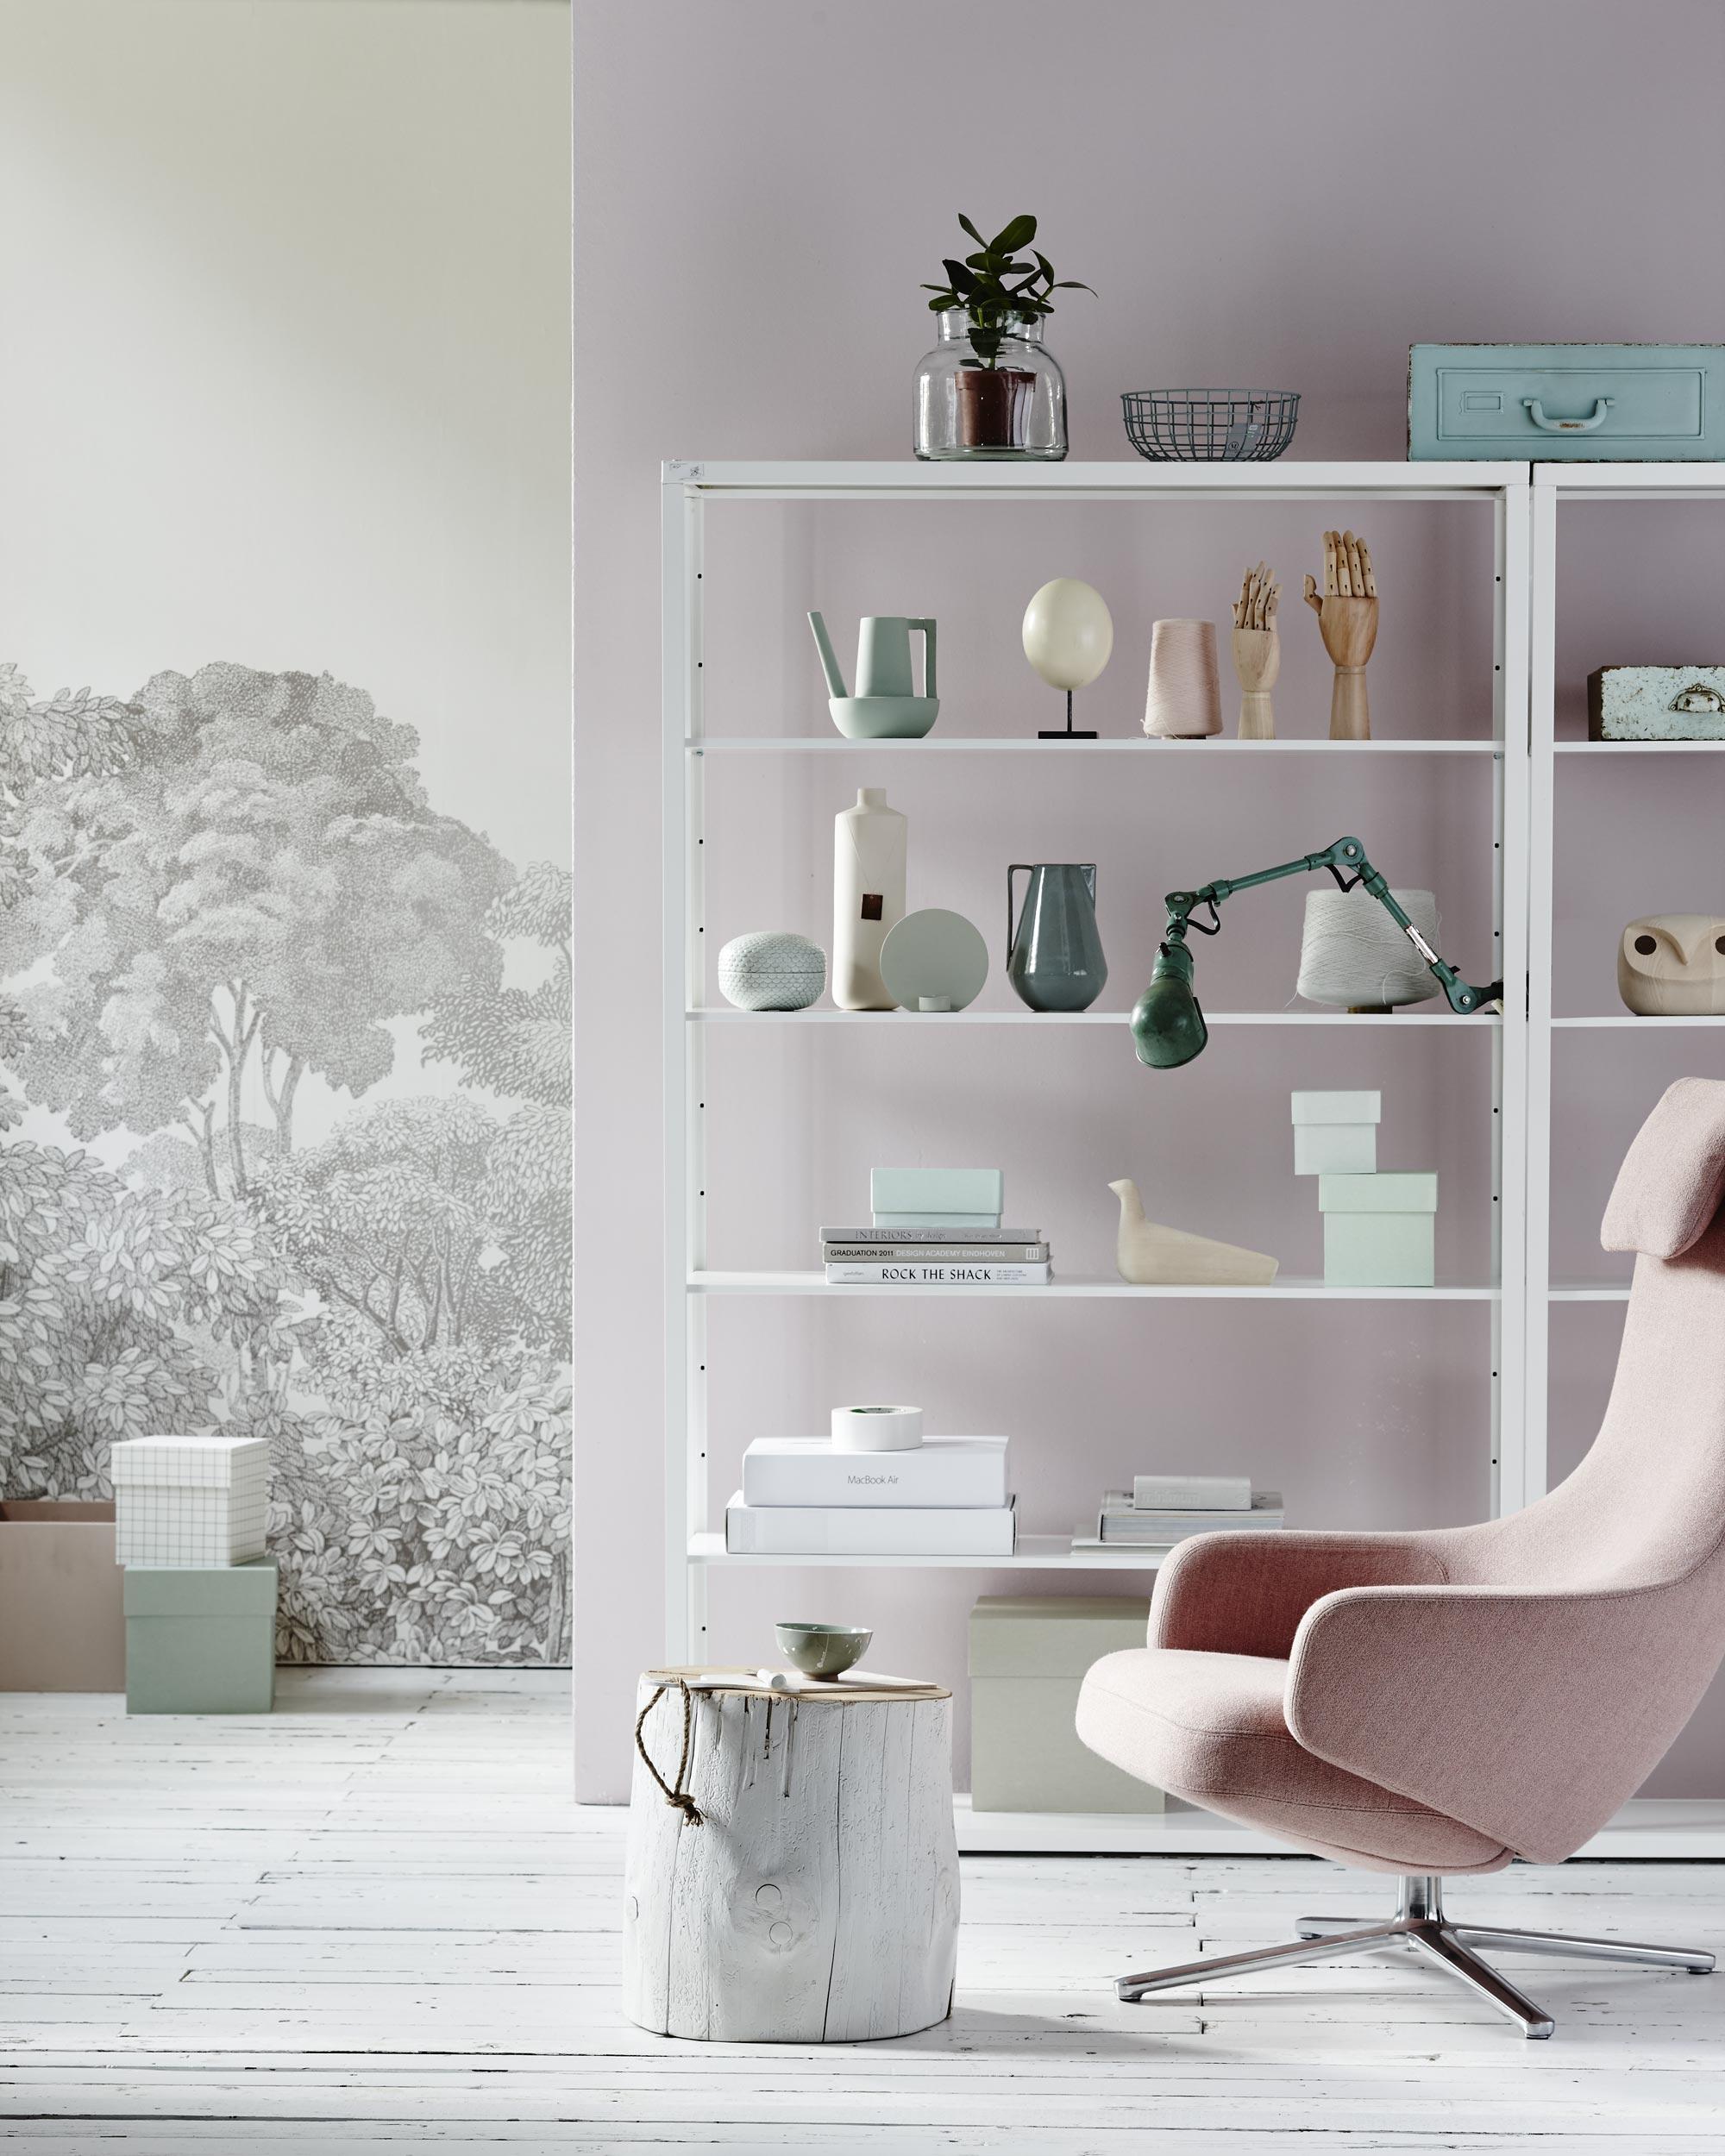 Design Glazen Bijzettafeltjes.Design Budget In Pastelkleuren Vtwonen